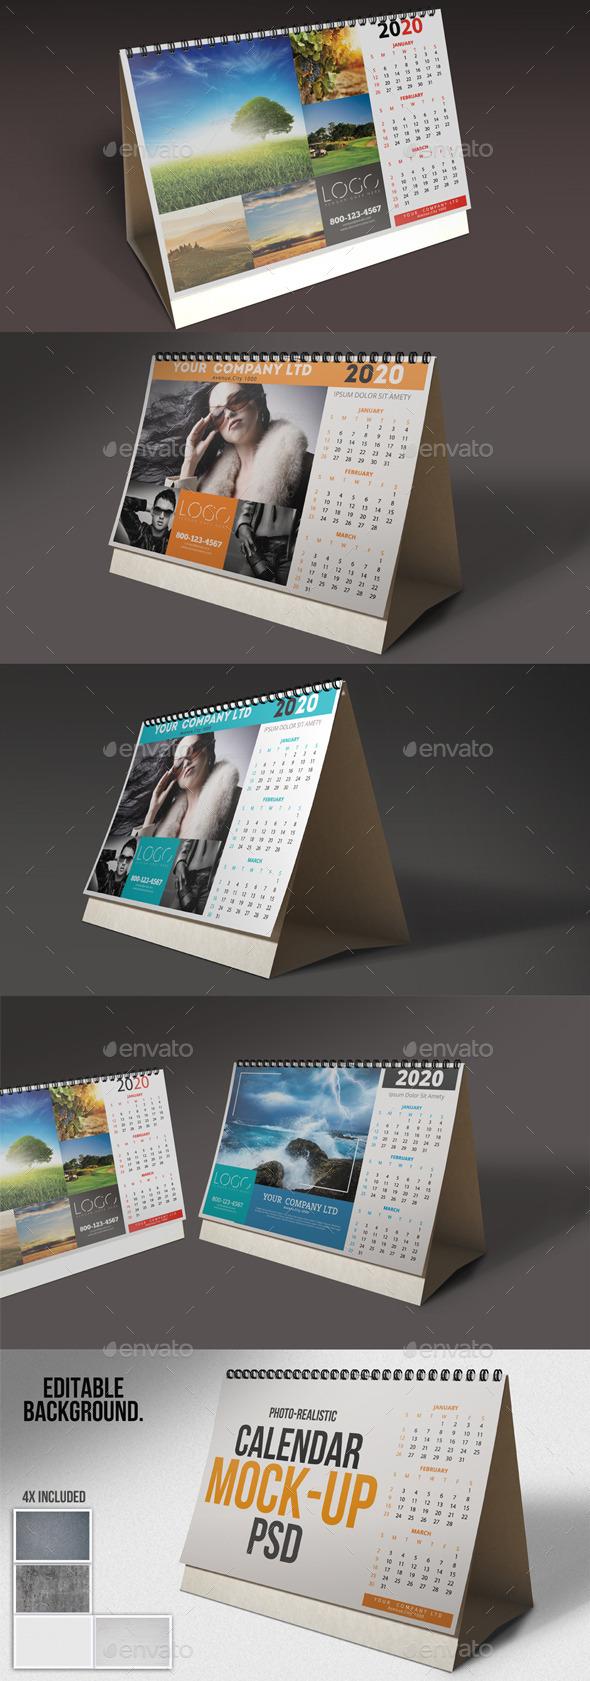 Desk Calendar Mock-Ups